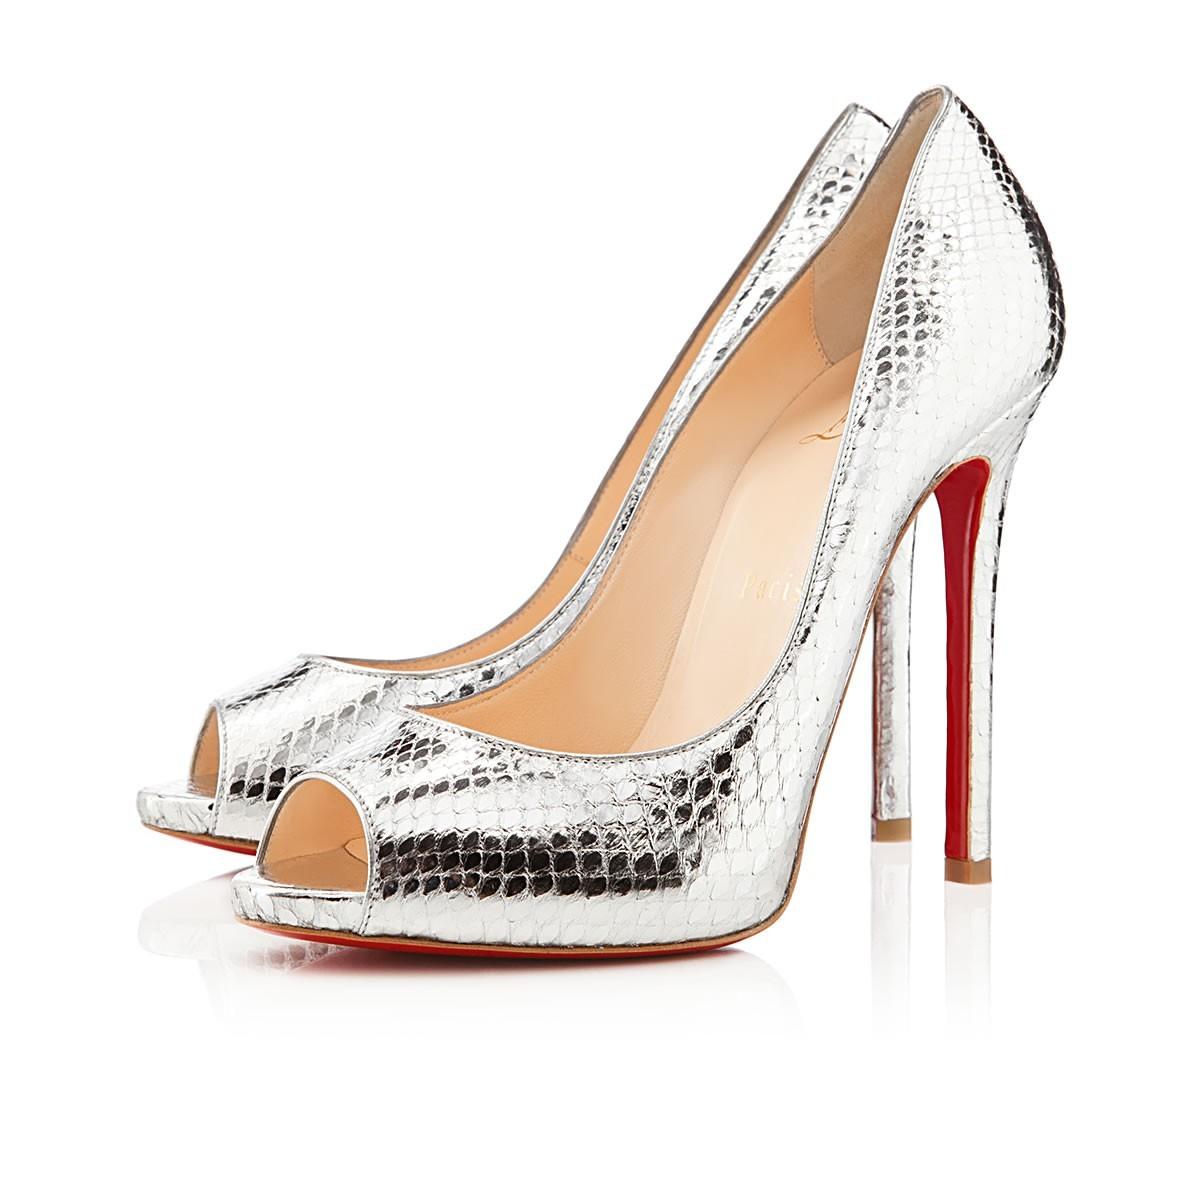 Christian Louboutin heels gold python peep toe